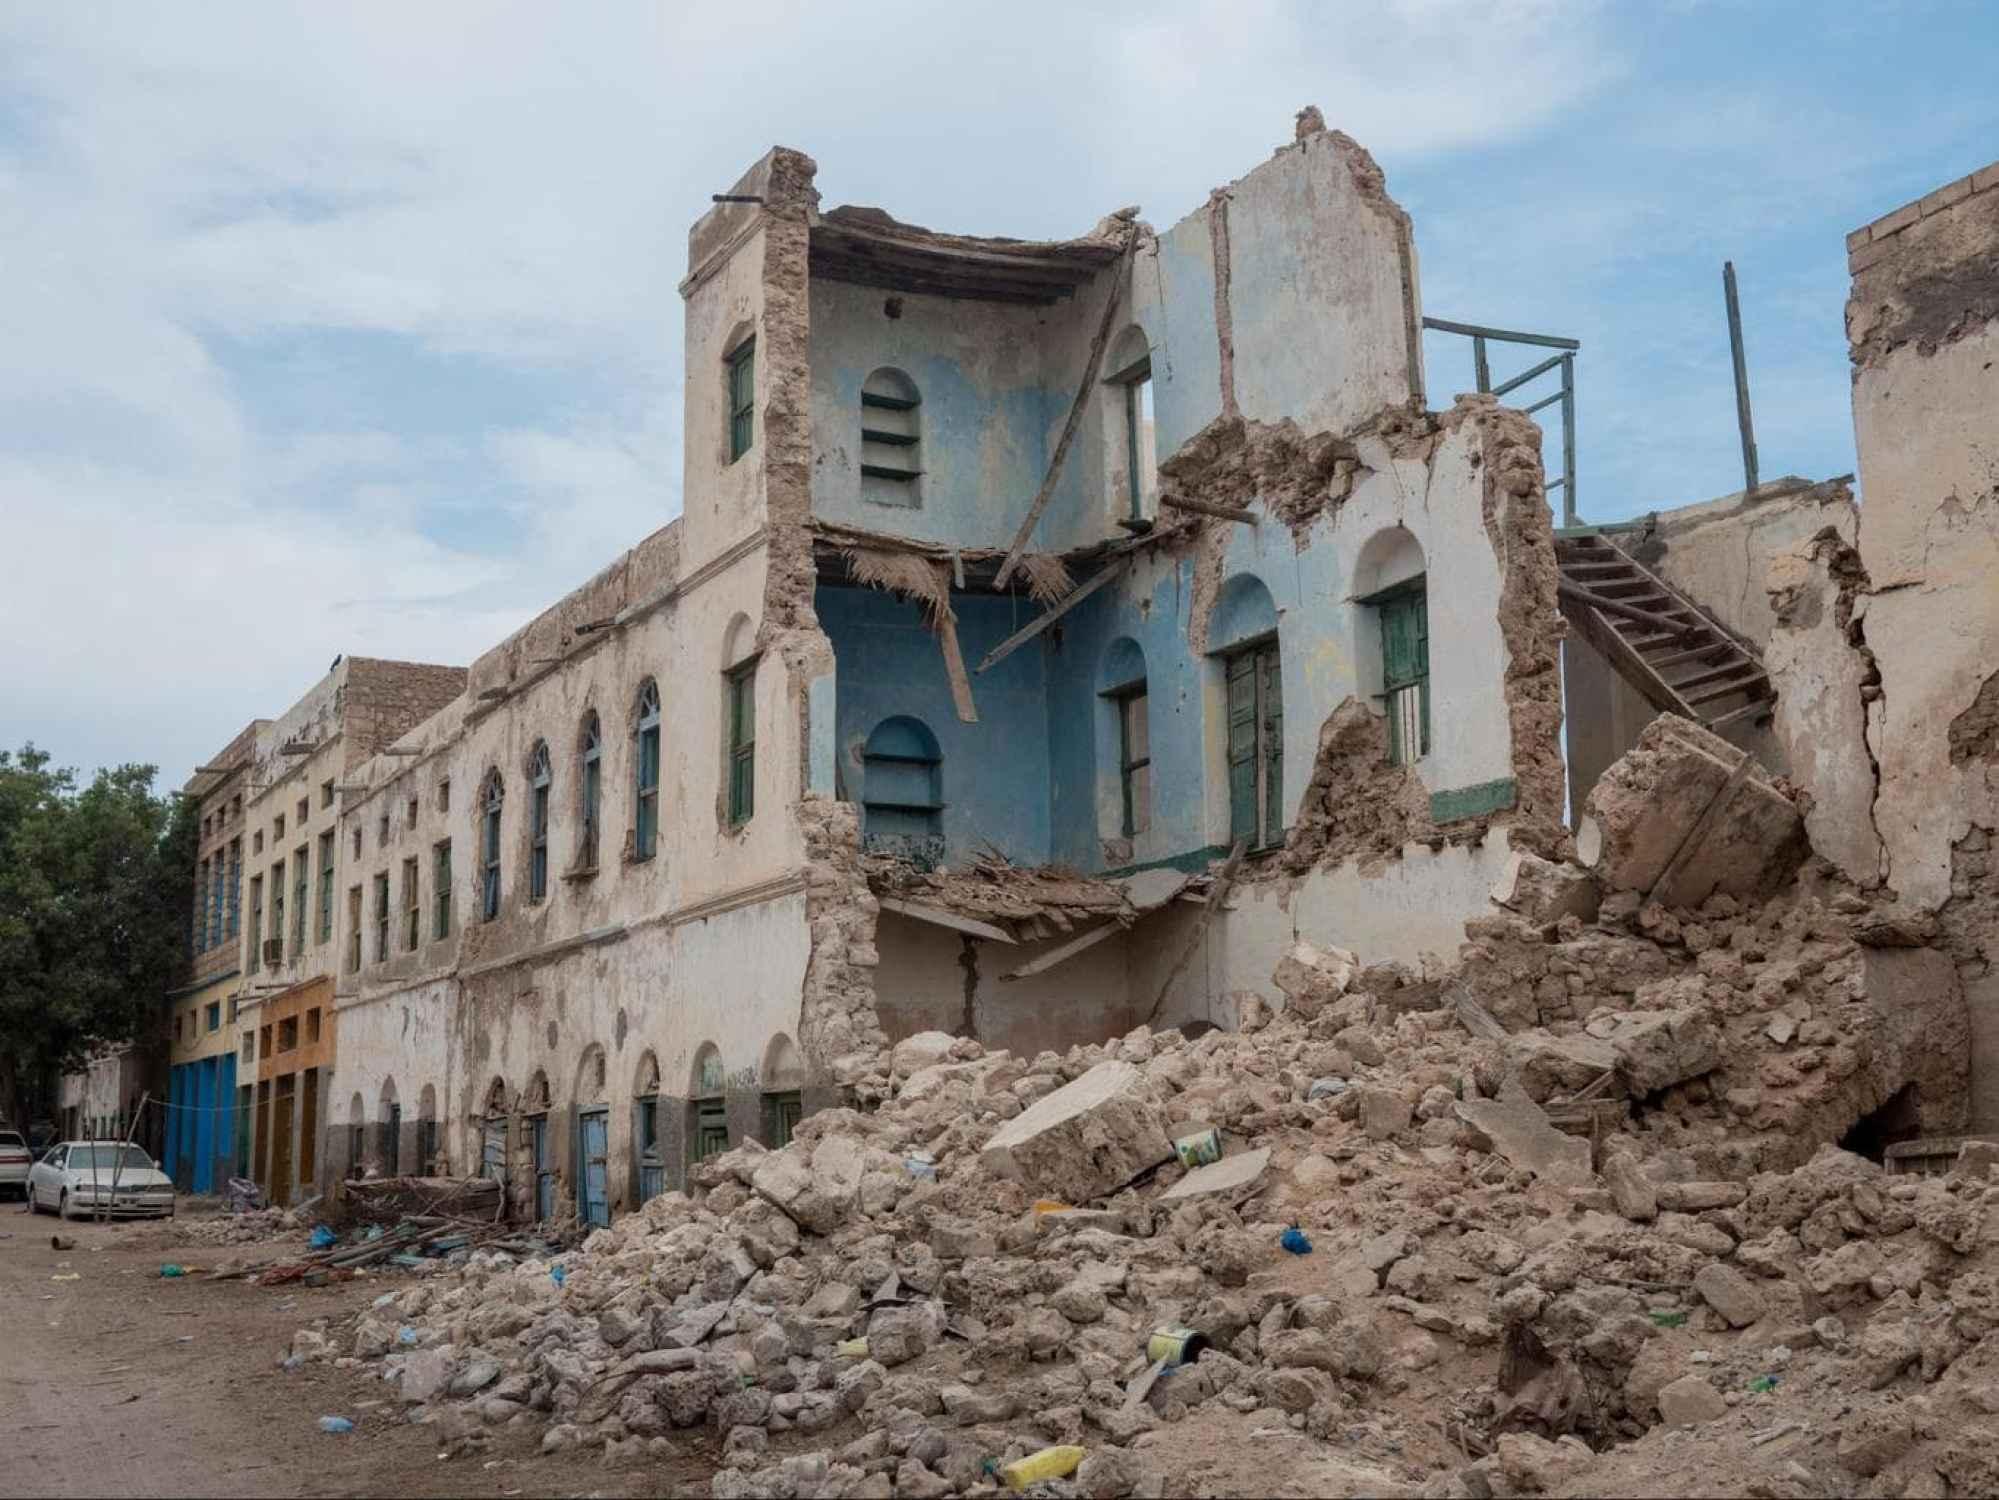 More old colonial buildings in Berbera